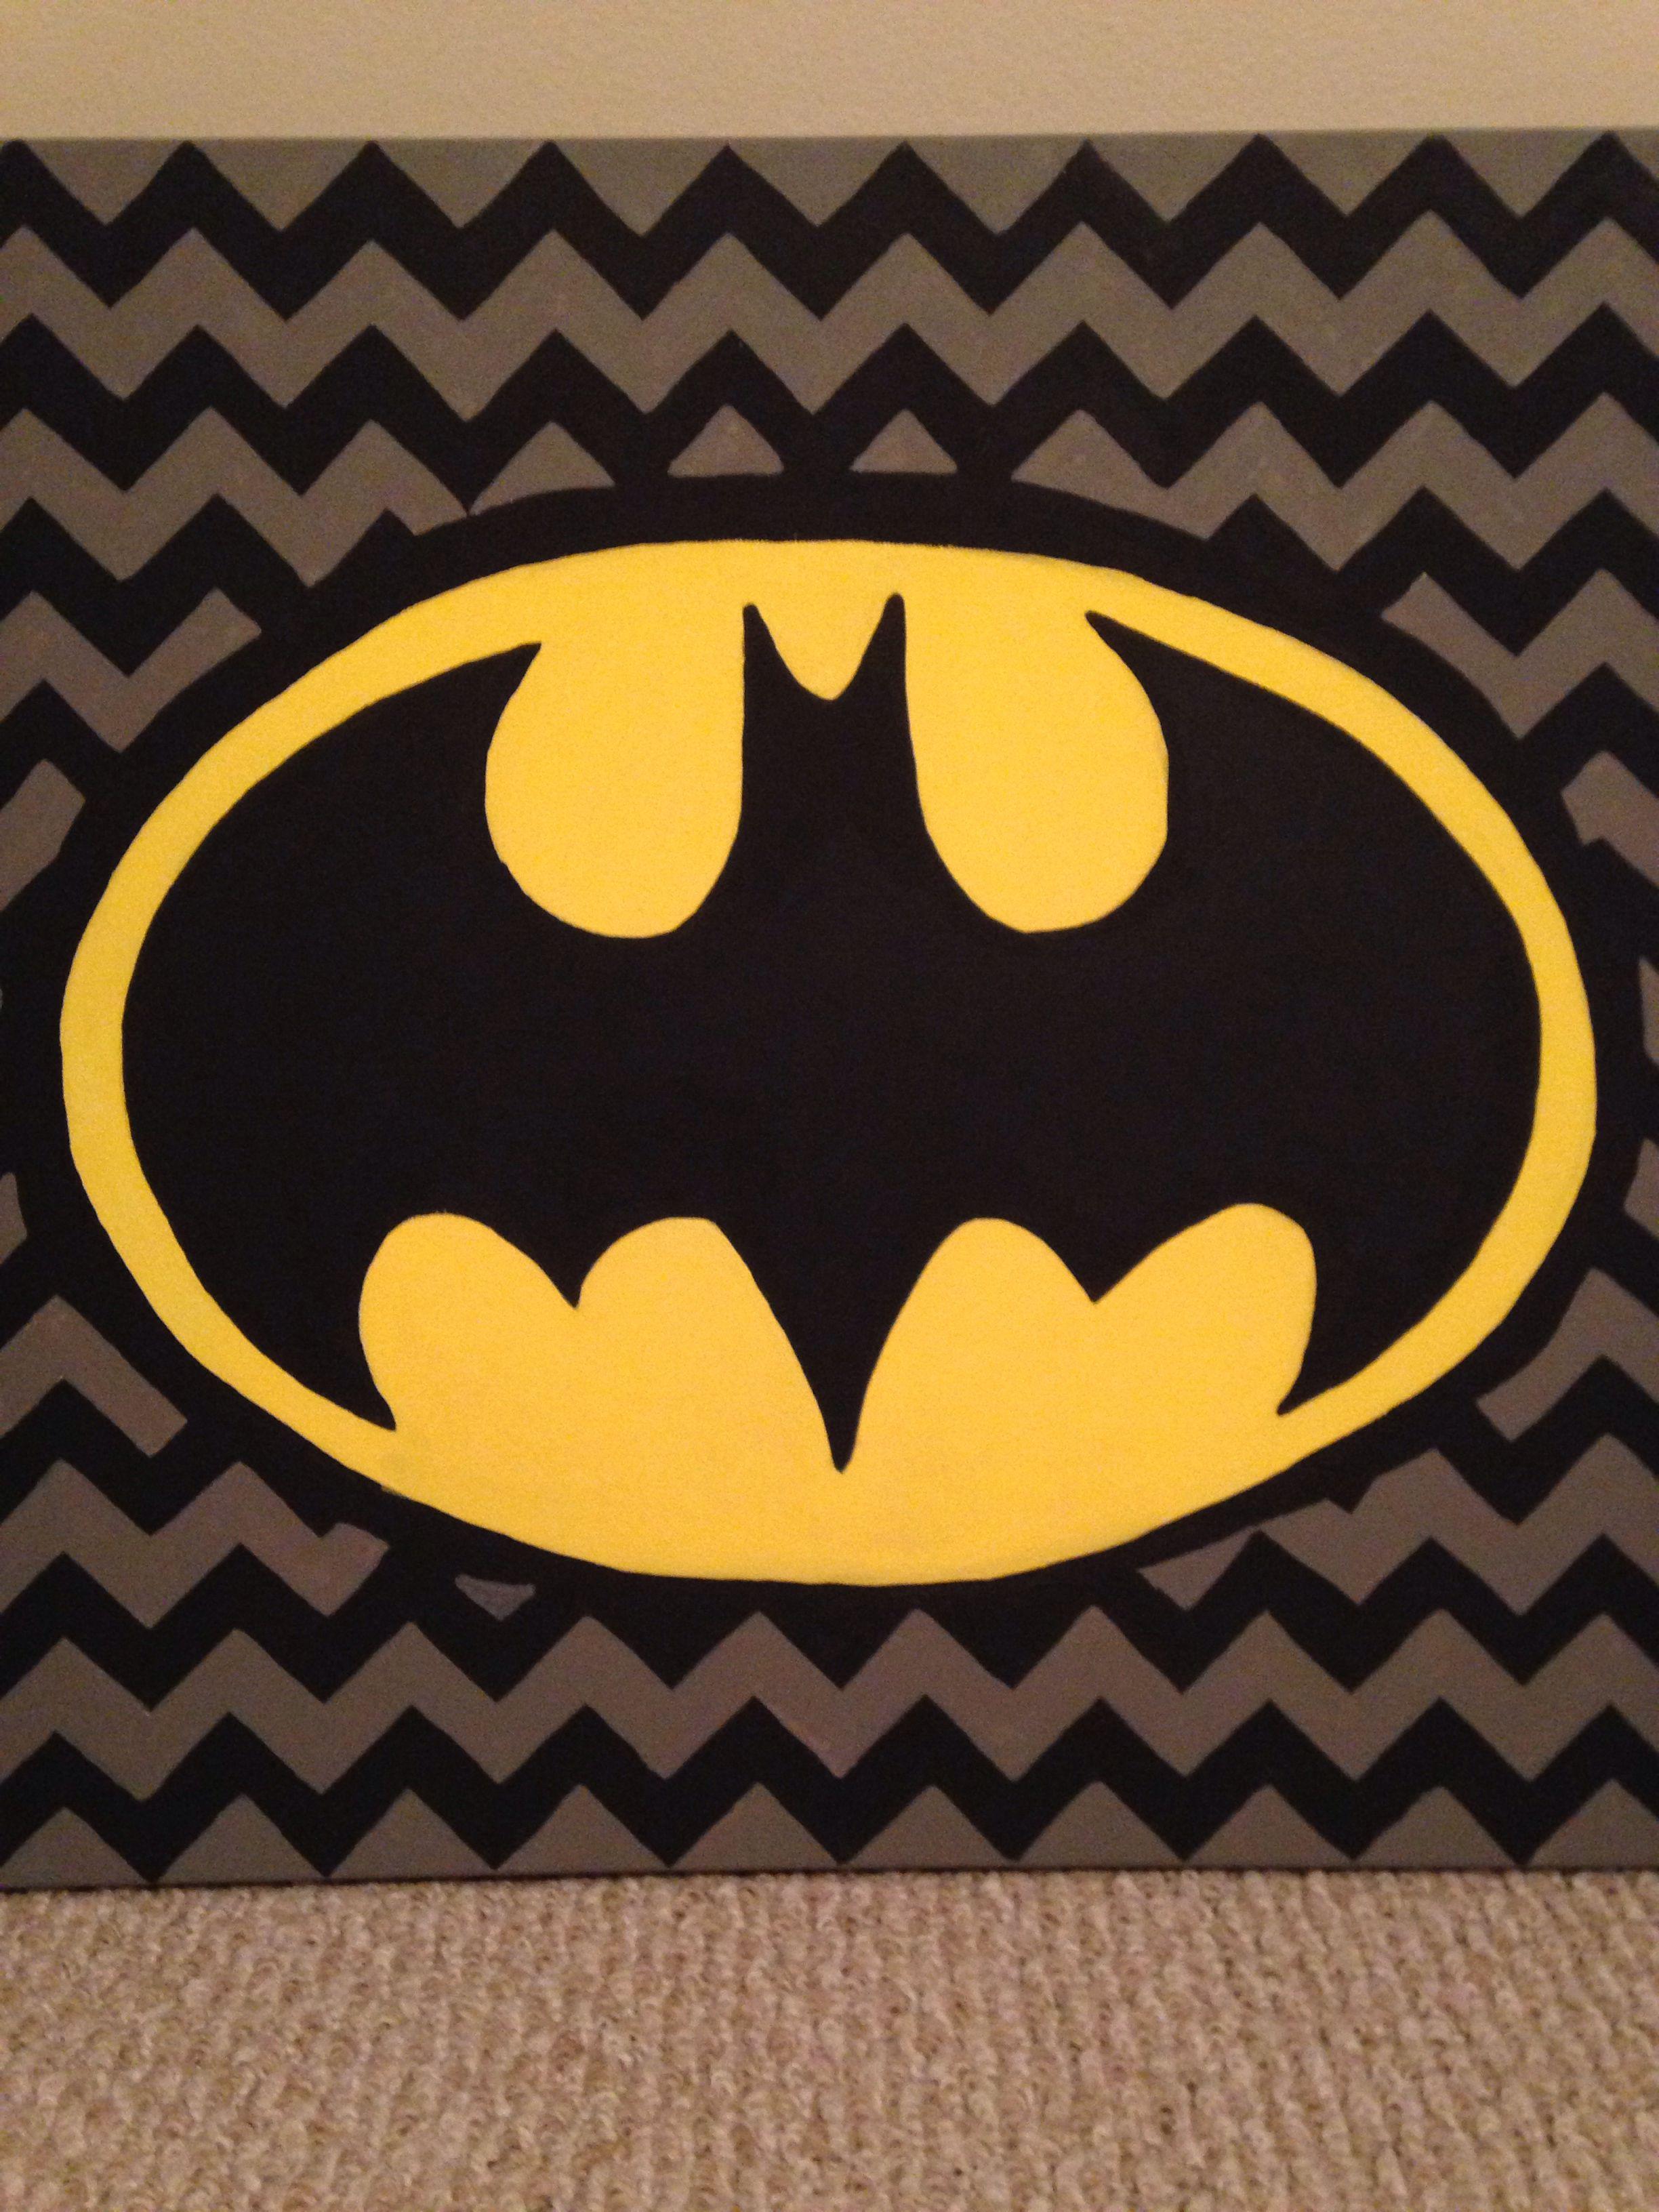 Superhero wall art - Batman Supplies - 20x20 canvas, acrylic paint ...